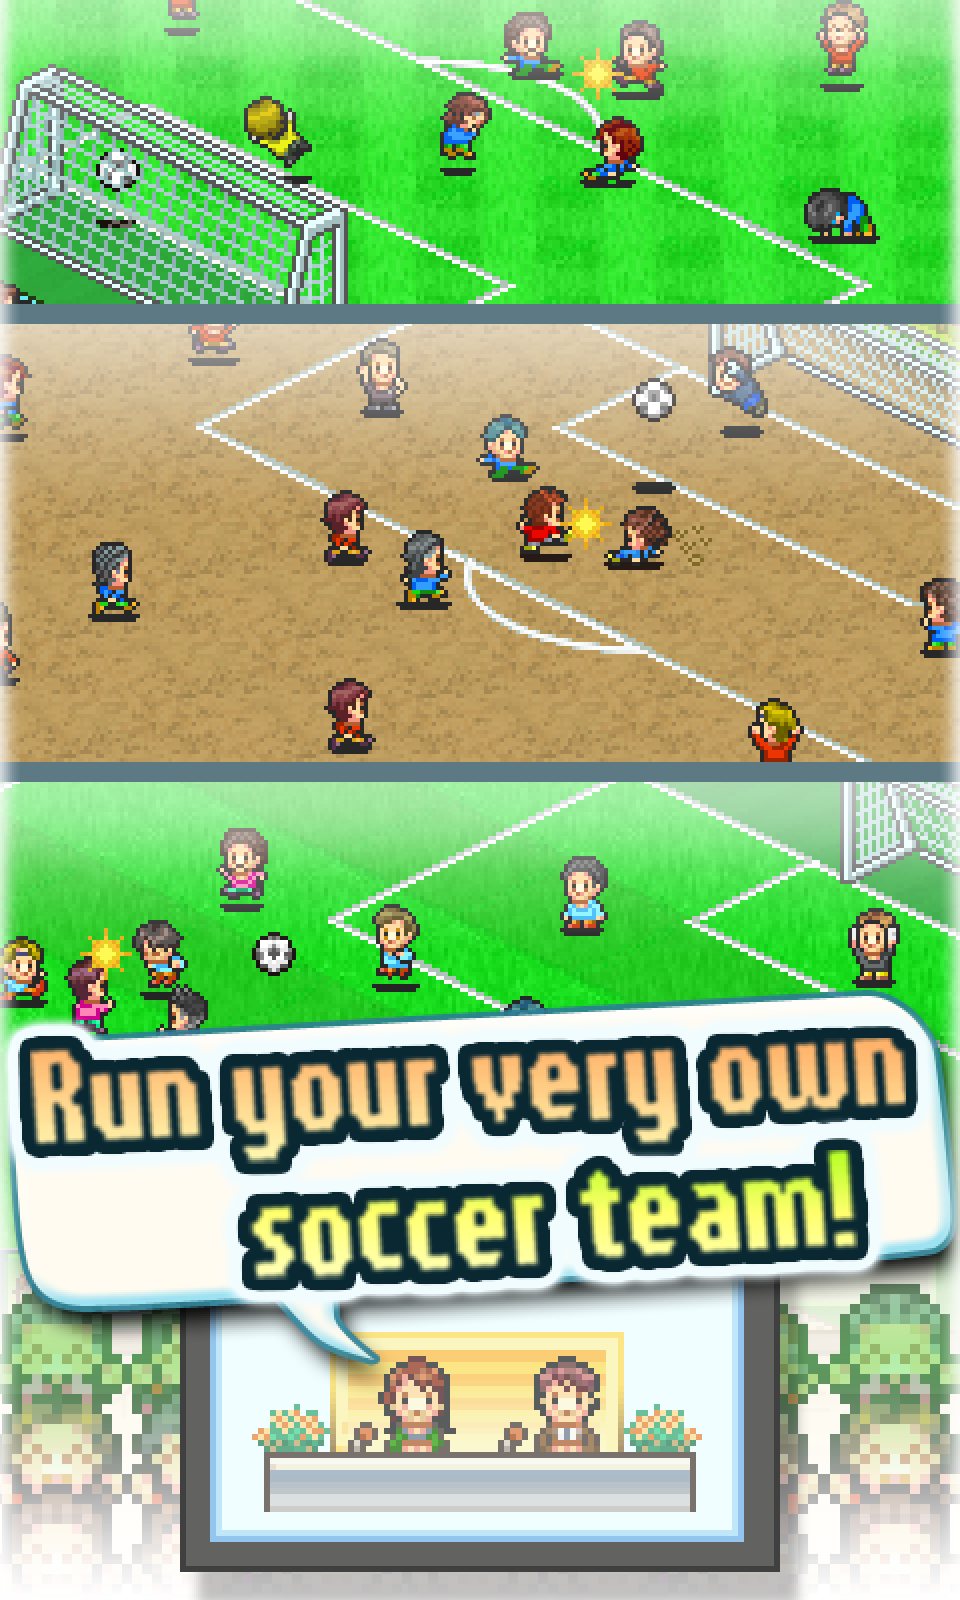 Pocket League Story 2 screenshot #18